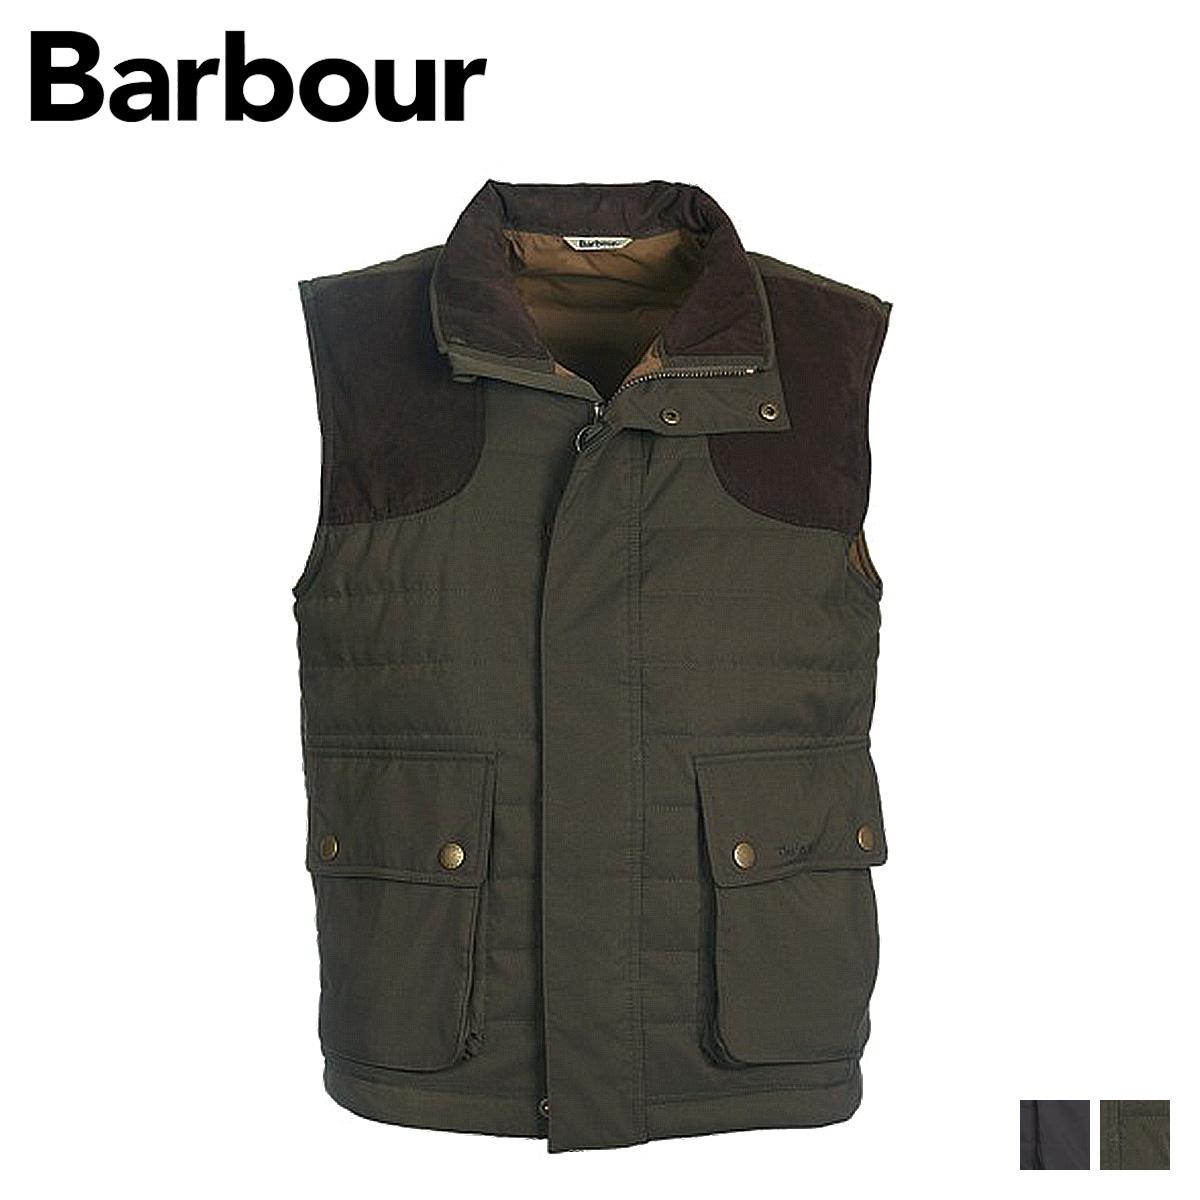 Barbour バブアー ジャケット キルトジャケット BARBOUR AVOCET QUILT JAKECT メンズ 【決算セール 返品不可】